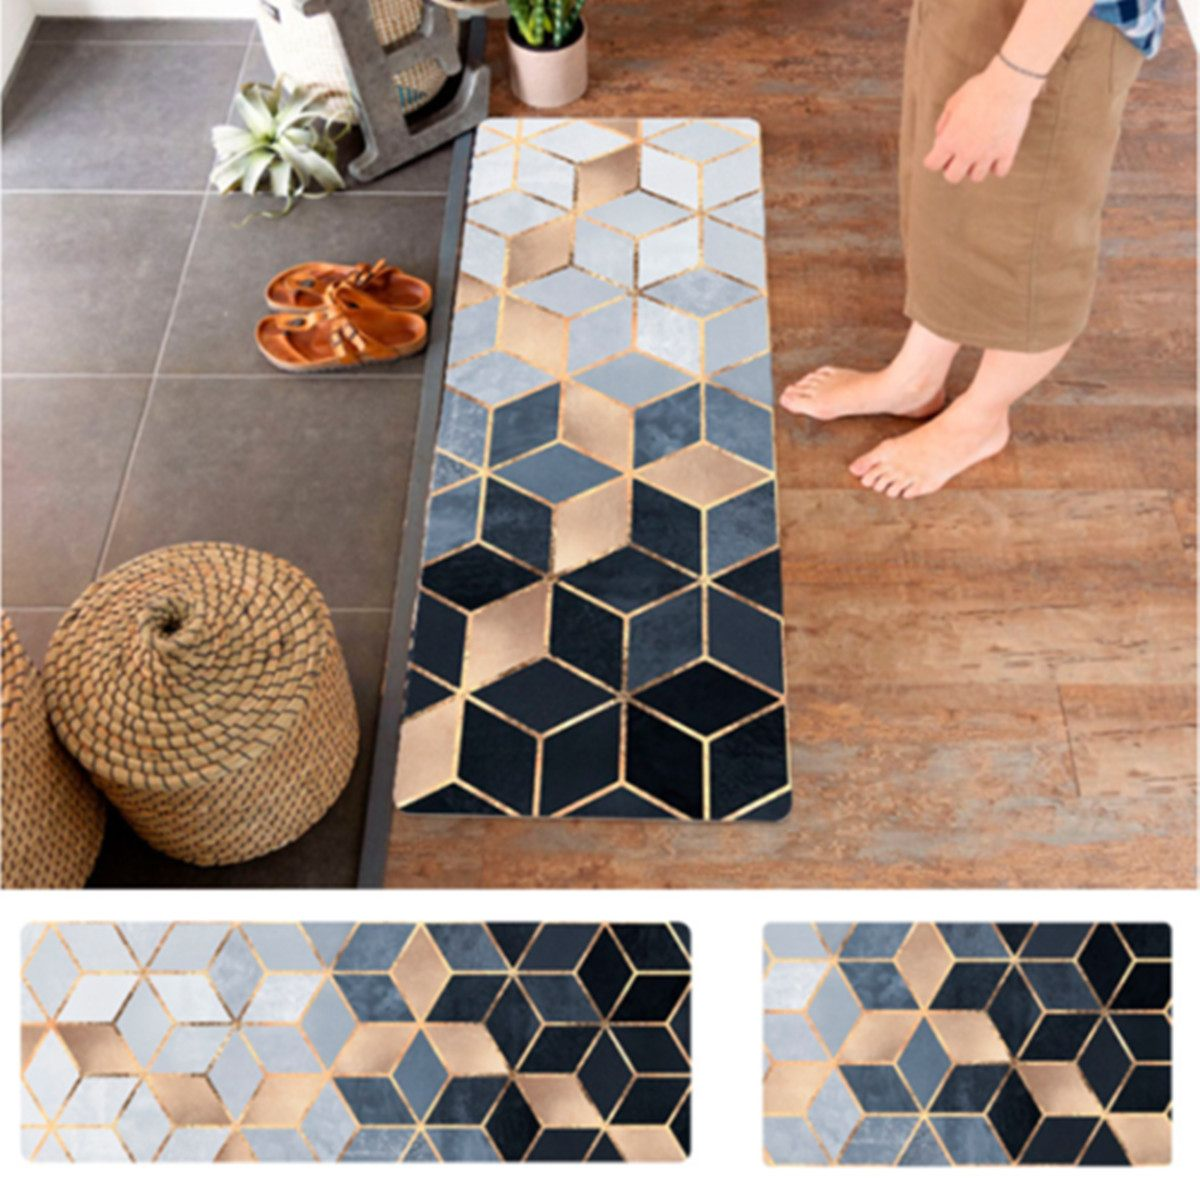 Us 9 91 30 Off Nordic Geometric Carpets Pvc Leather Floor Mats Large Floor Carpets Doormats Bedroom Tatami Waterproof Oilproof Kitchen Rugs On